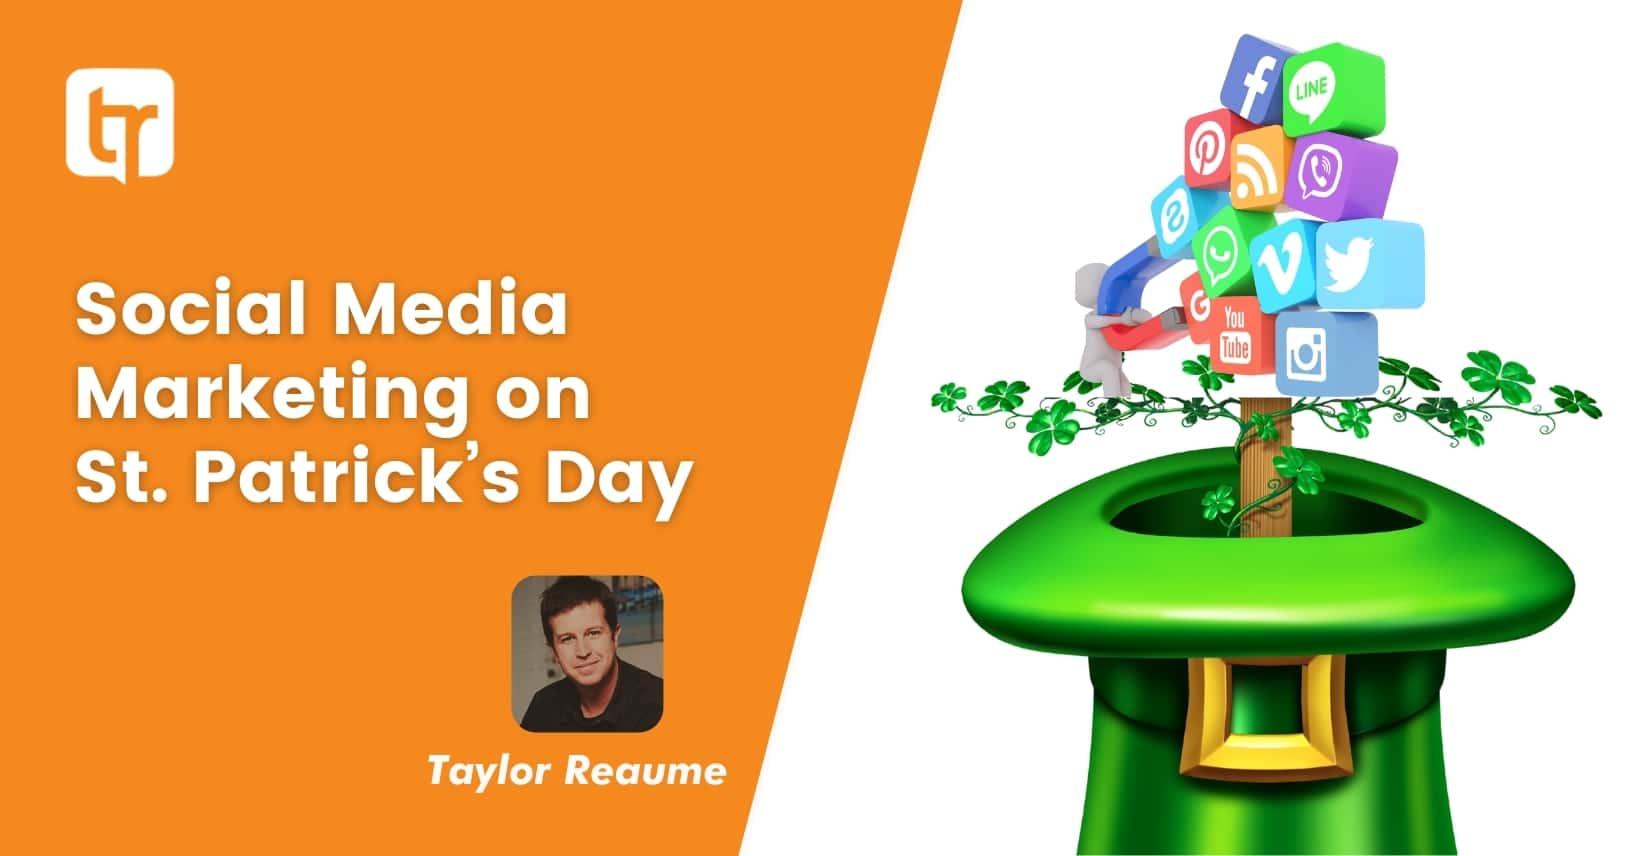 Social Media Marketing on St. Patrick's Day